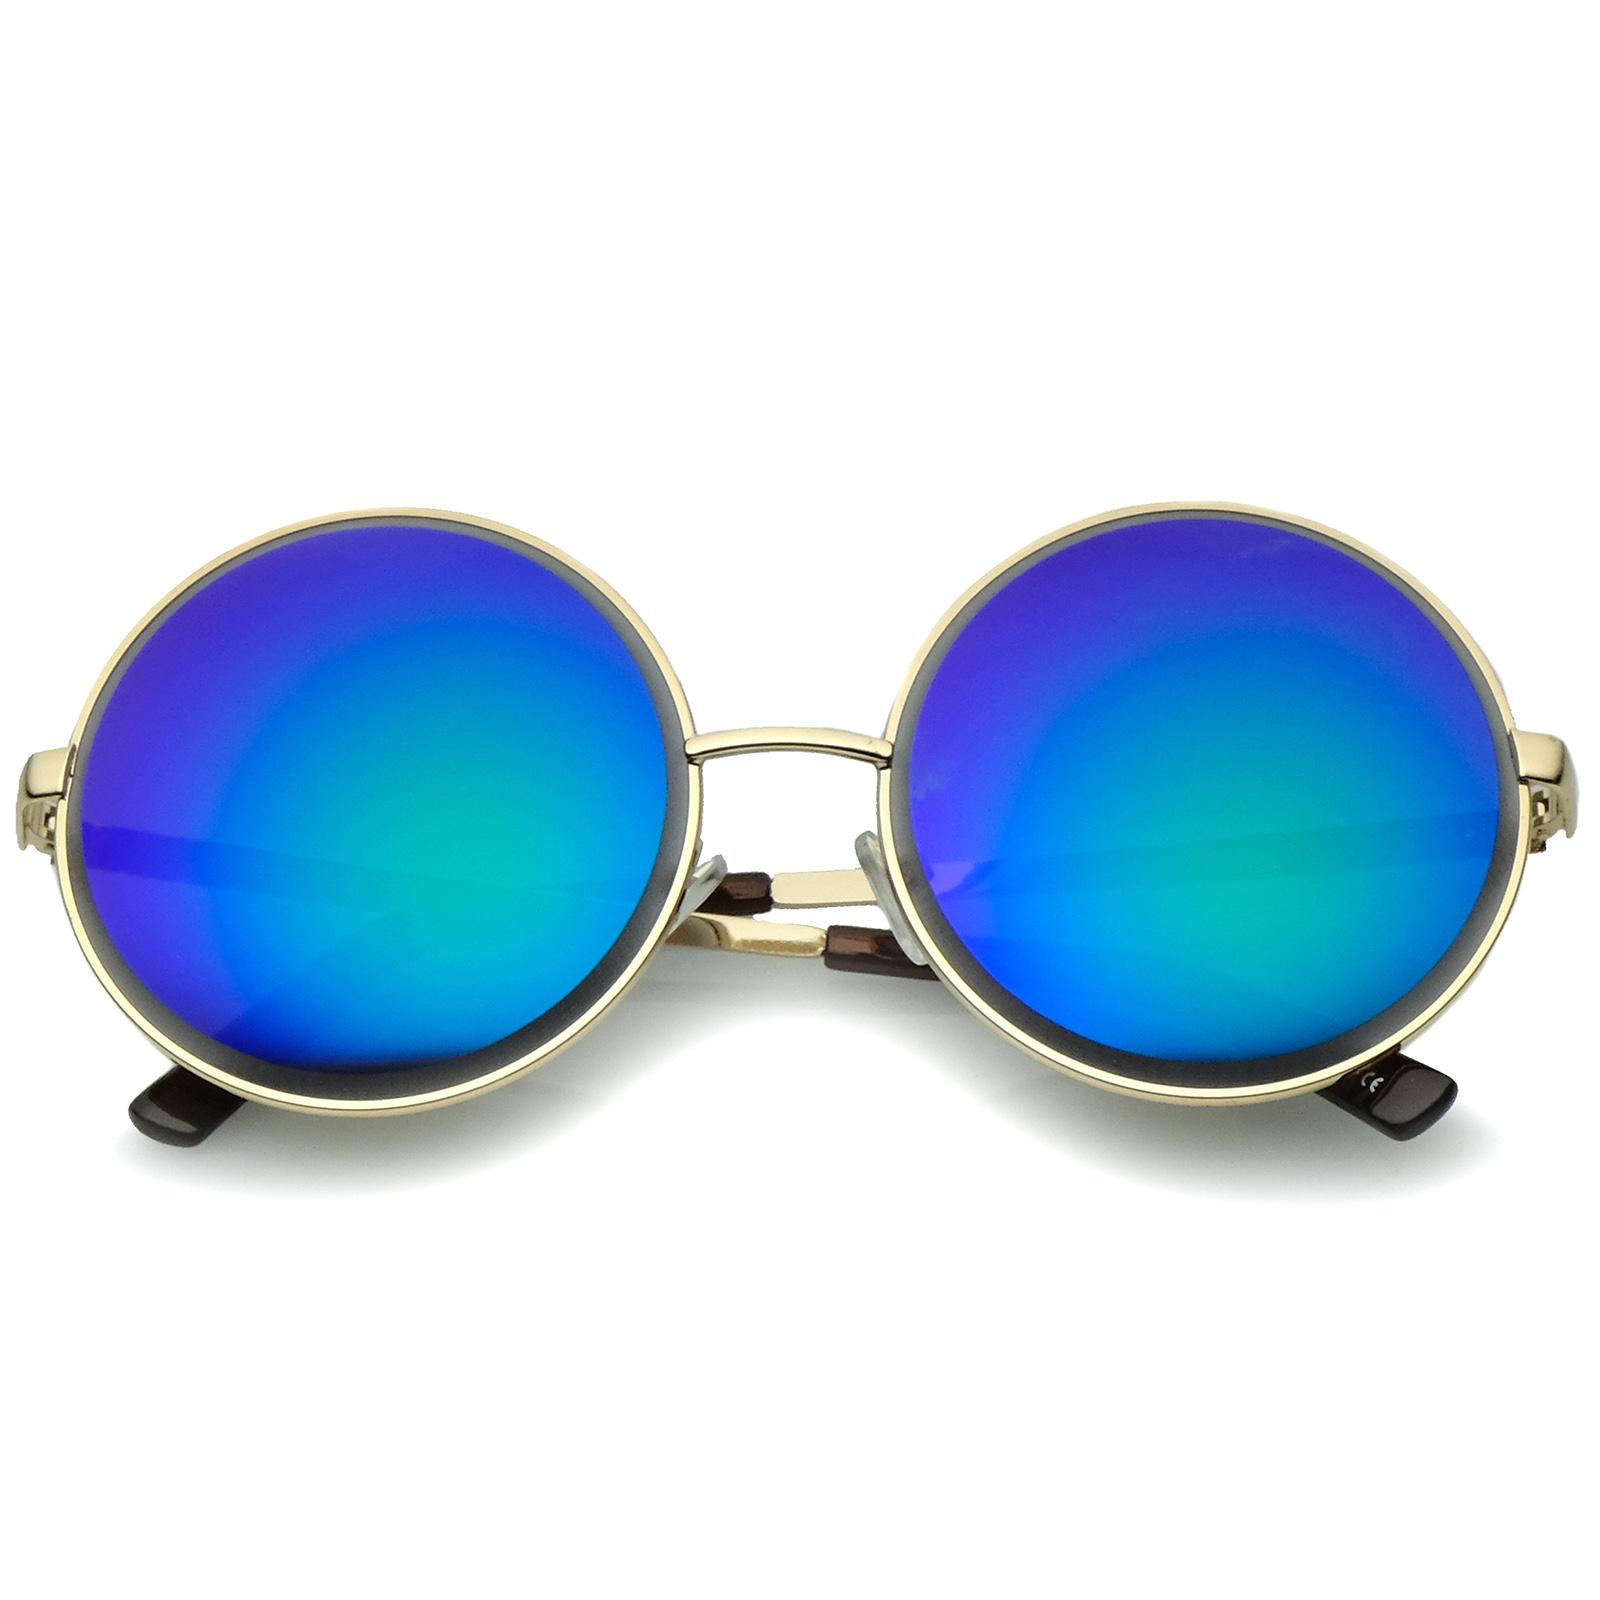 sunglassLA-Oversize-Metal-Frame-Etched-Edge-Colored-Mirror-Lens-Round-Sunglasses